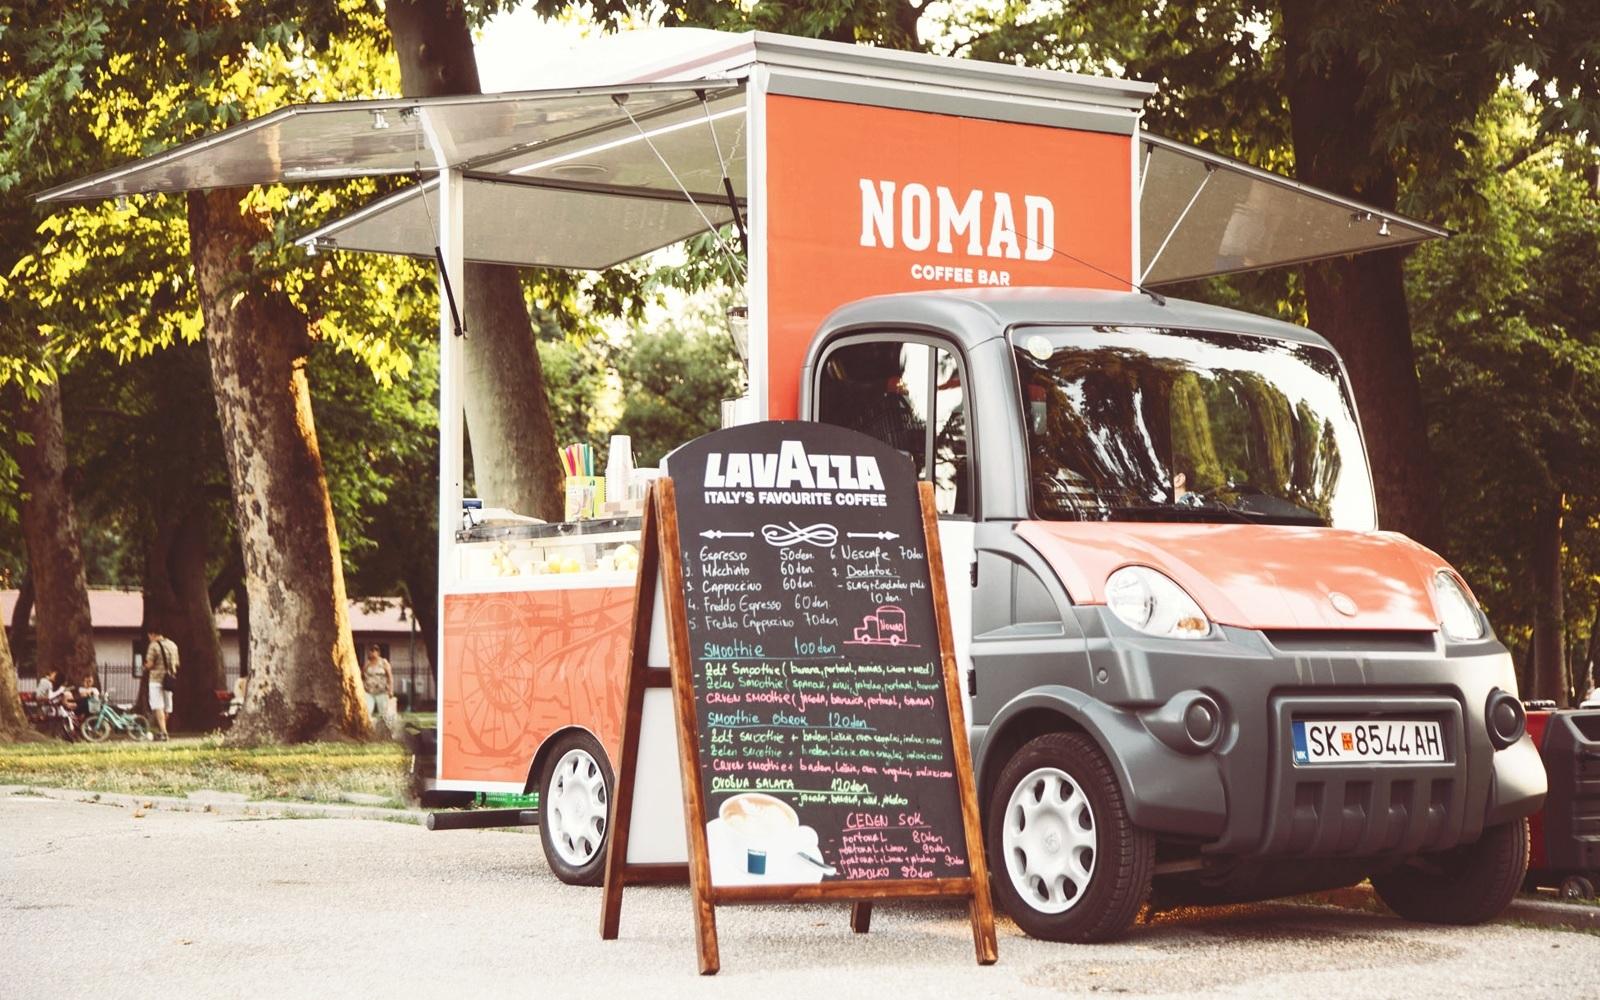 Nomad-Web-Ride